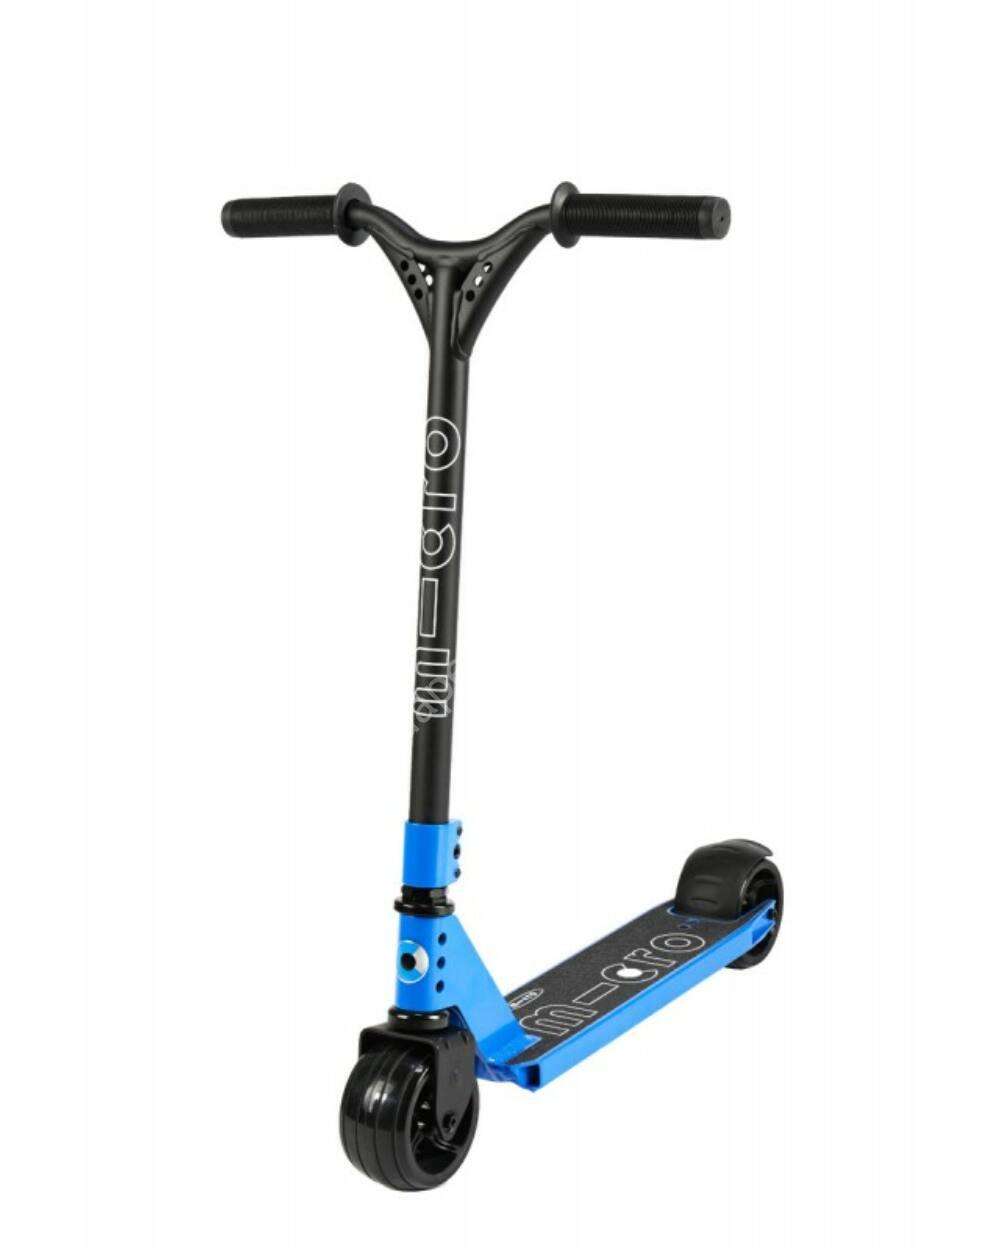 Micro mX Freeride Street extrém roller